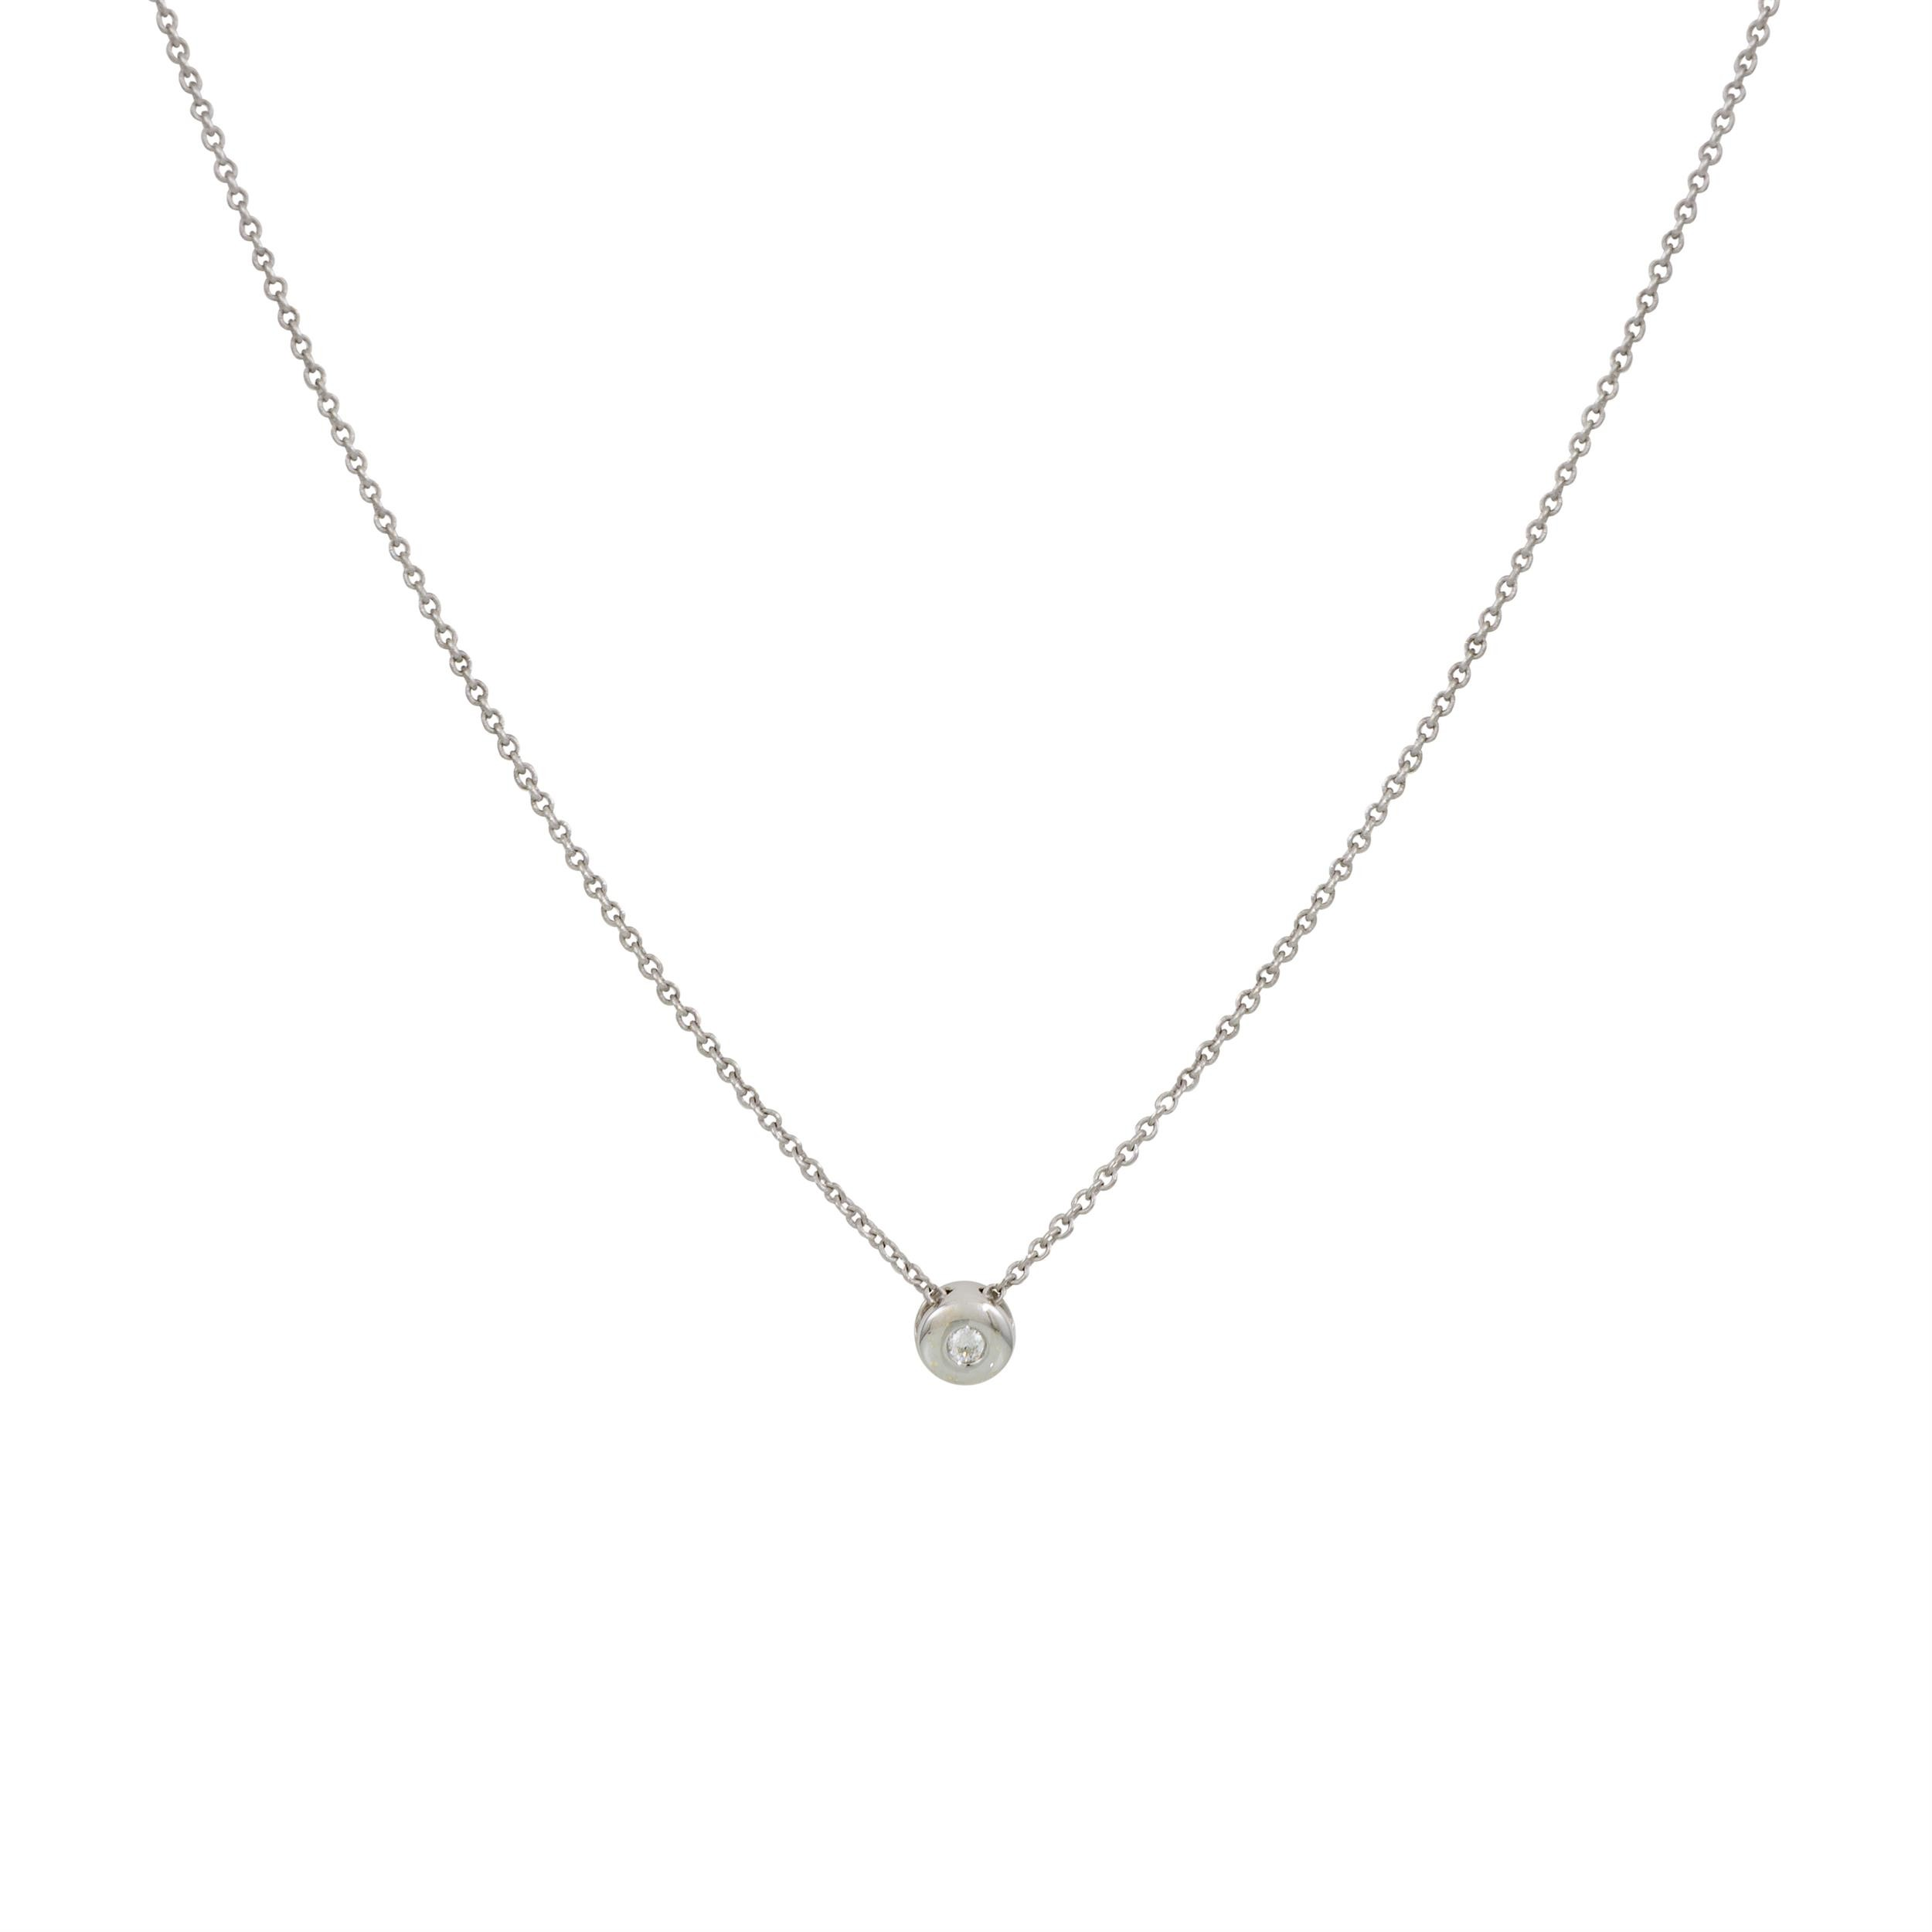 Diamant - 0.03 ct - gh/si3 45 cm - ankerschakel - diamant - 0.03 ct - gh/si3 202.3010.45